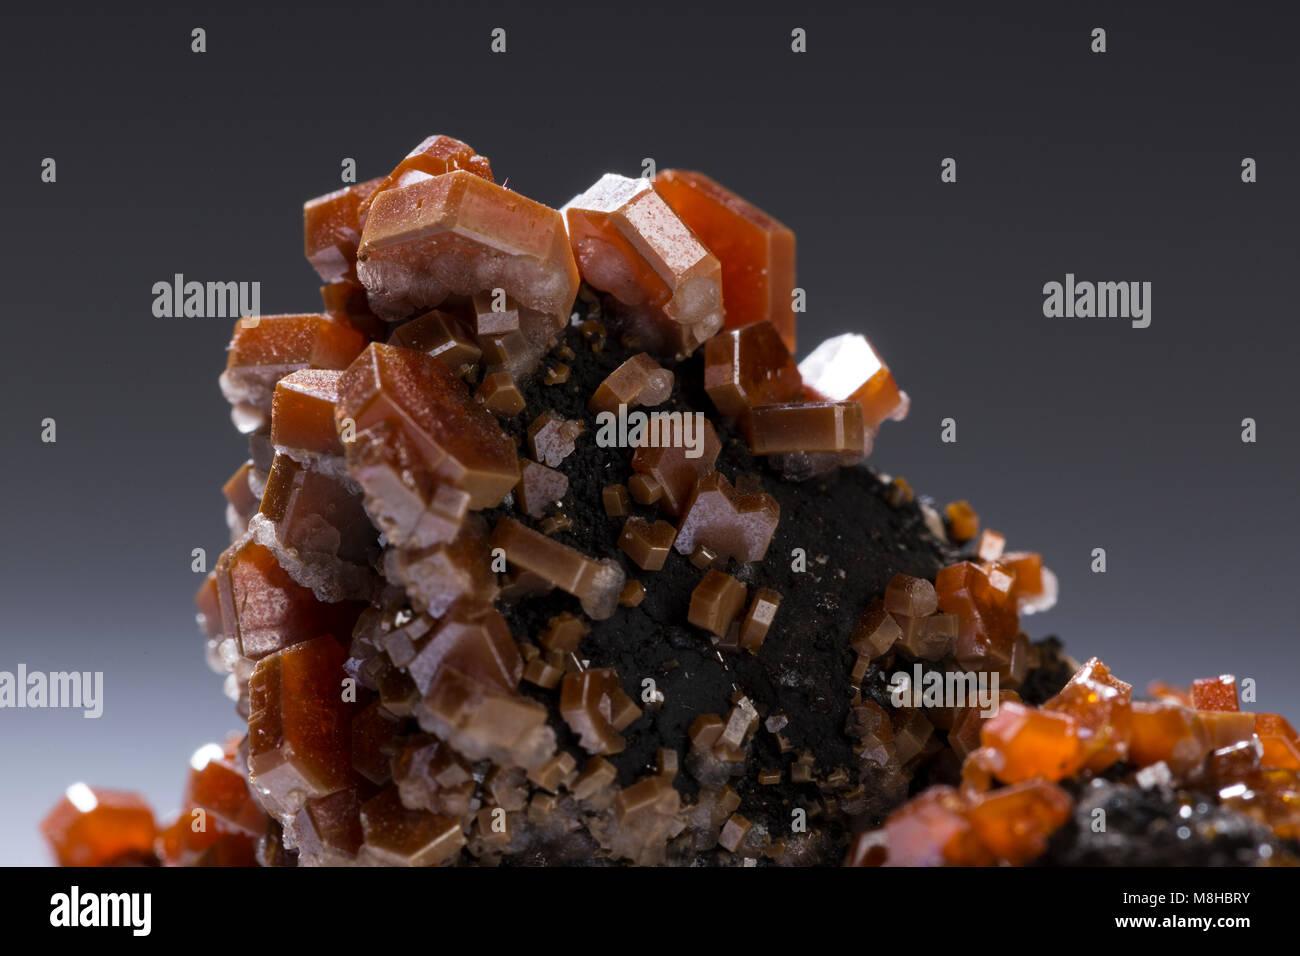 vanadinite mineral stone specimens rock geology minerals. - Stock Image